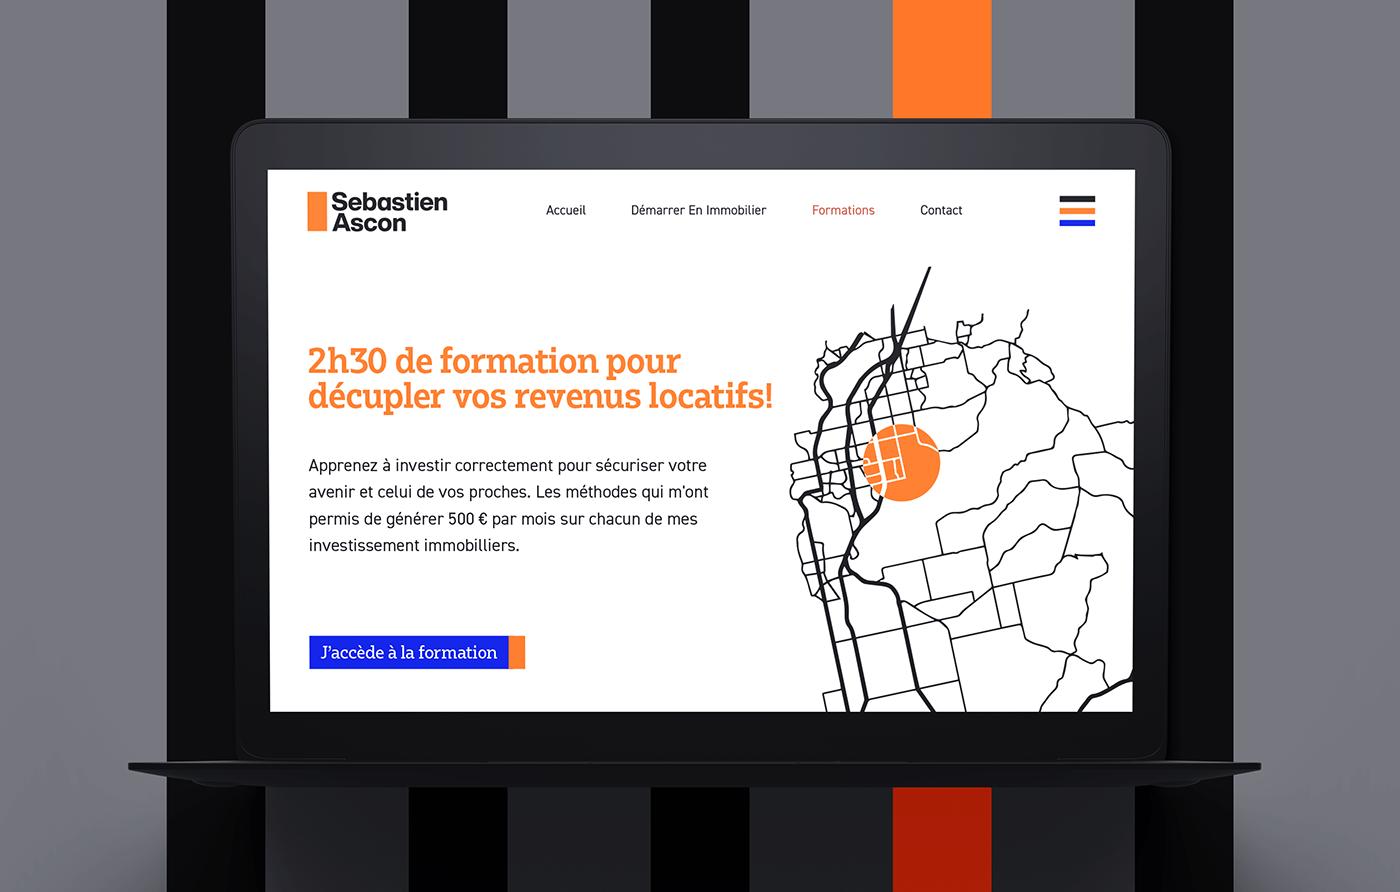 sebastien ascon website prototype